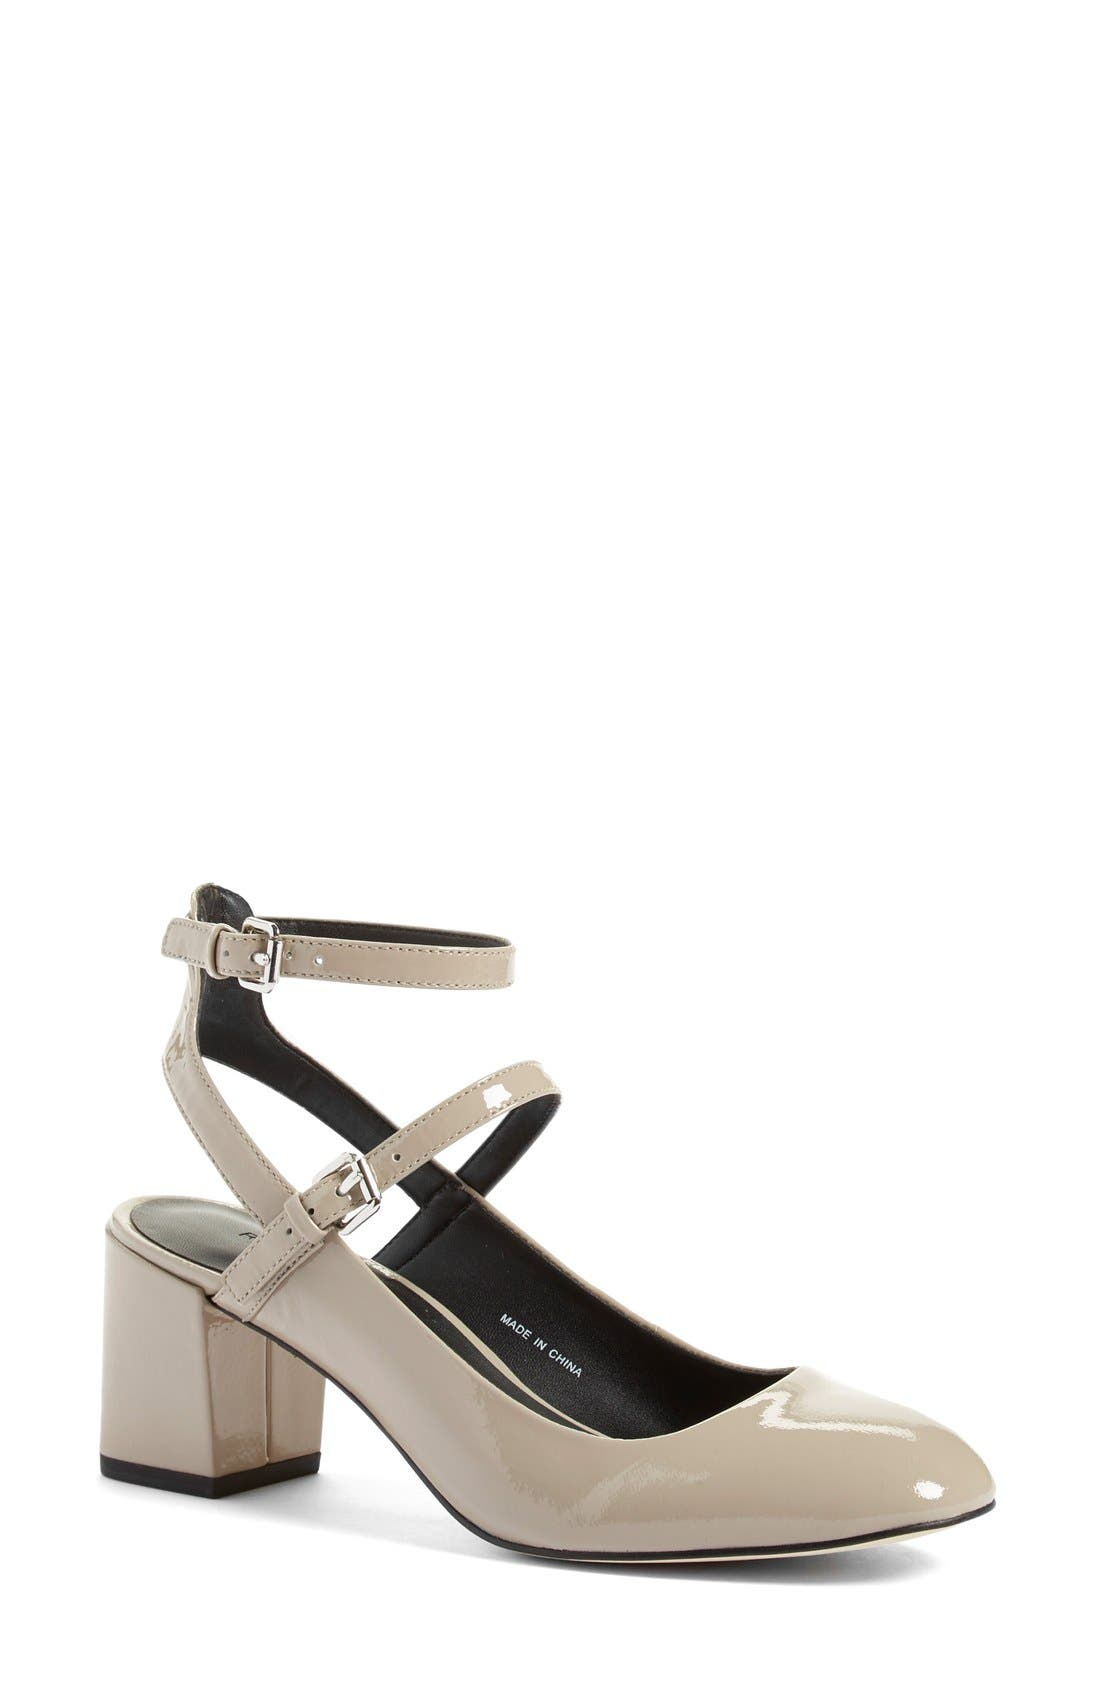 Rebecca Minkoff 'Brooke' Ankle Strap Pump (Women)